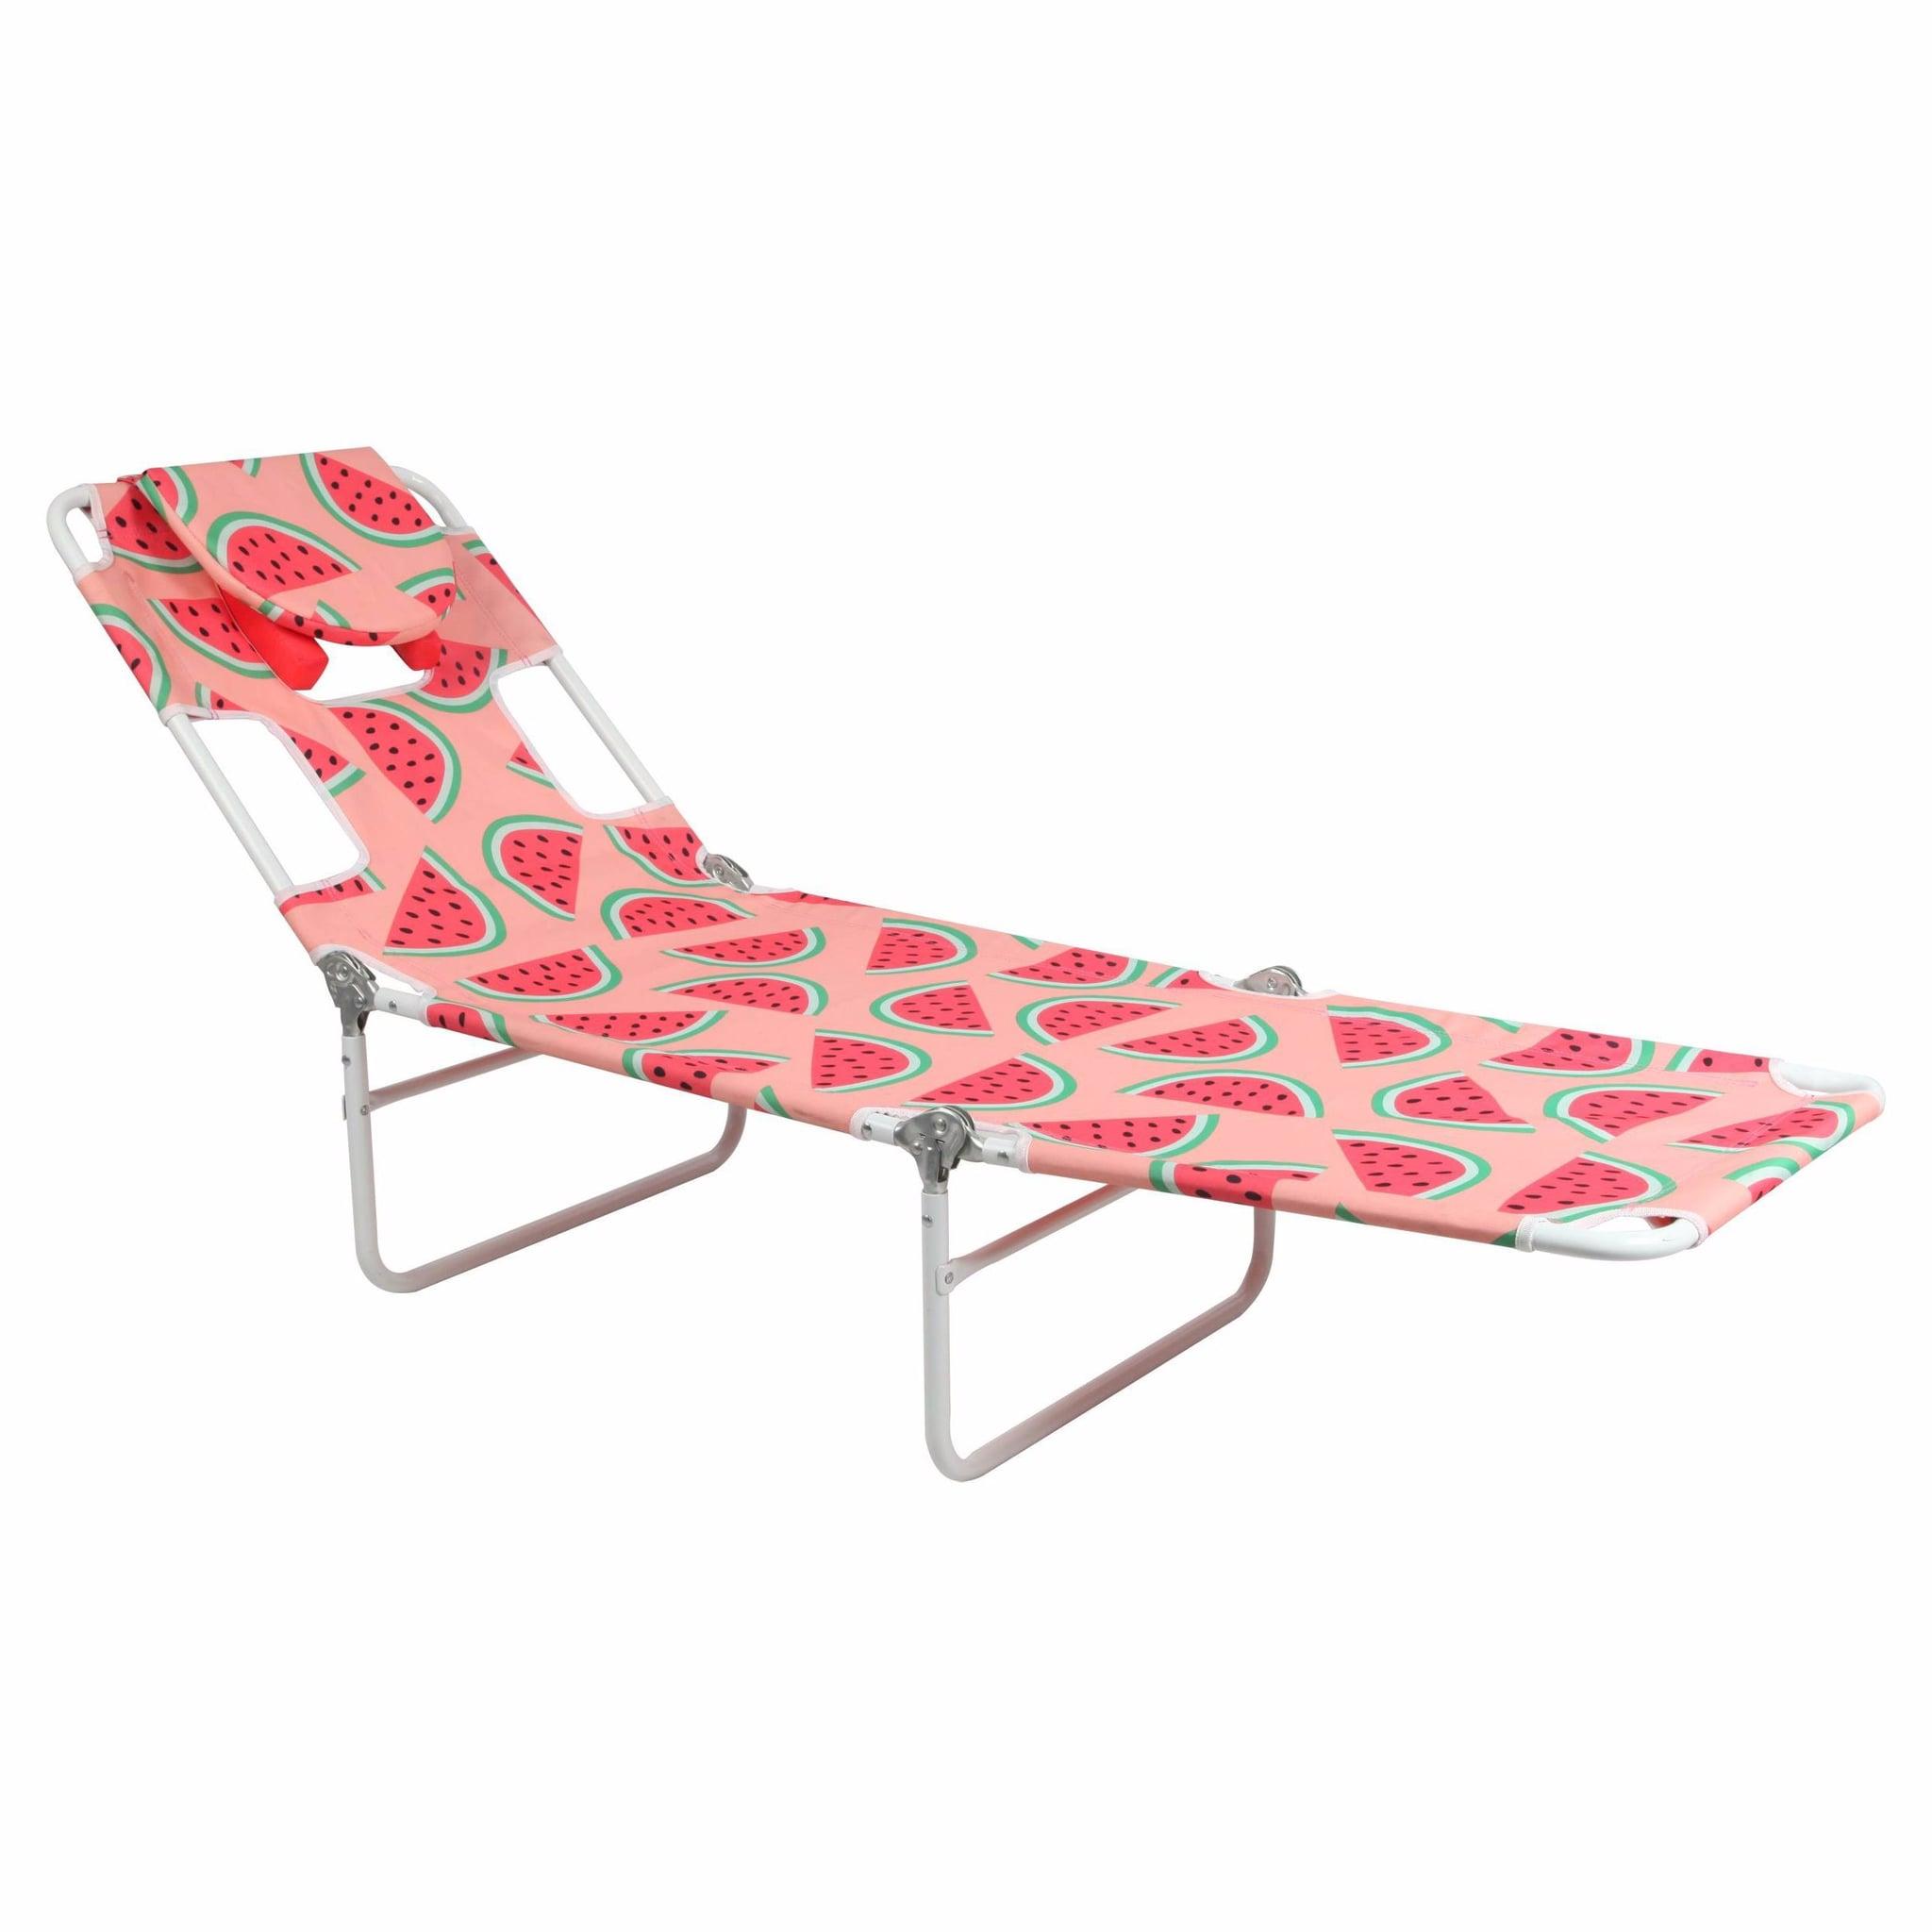 Tar Beach Chairs Awesome Cvs Beach Chairs Tommy Bahama Beach Chair With F